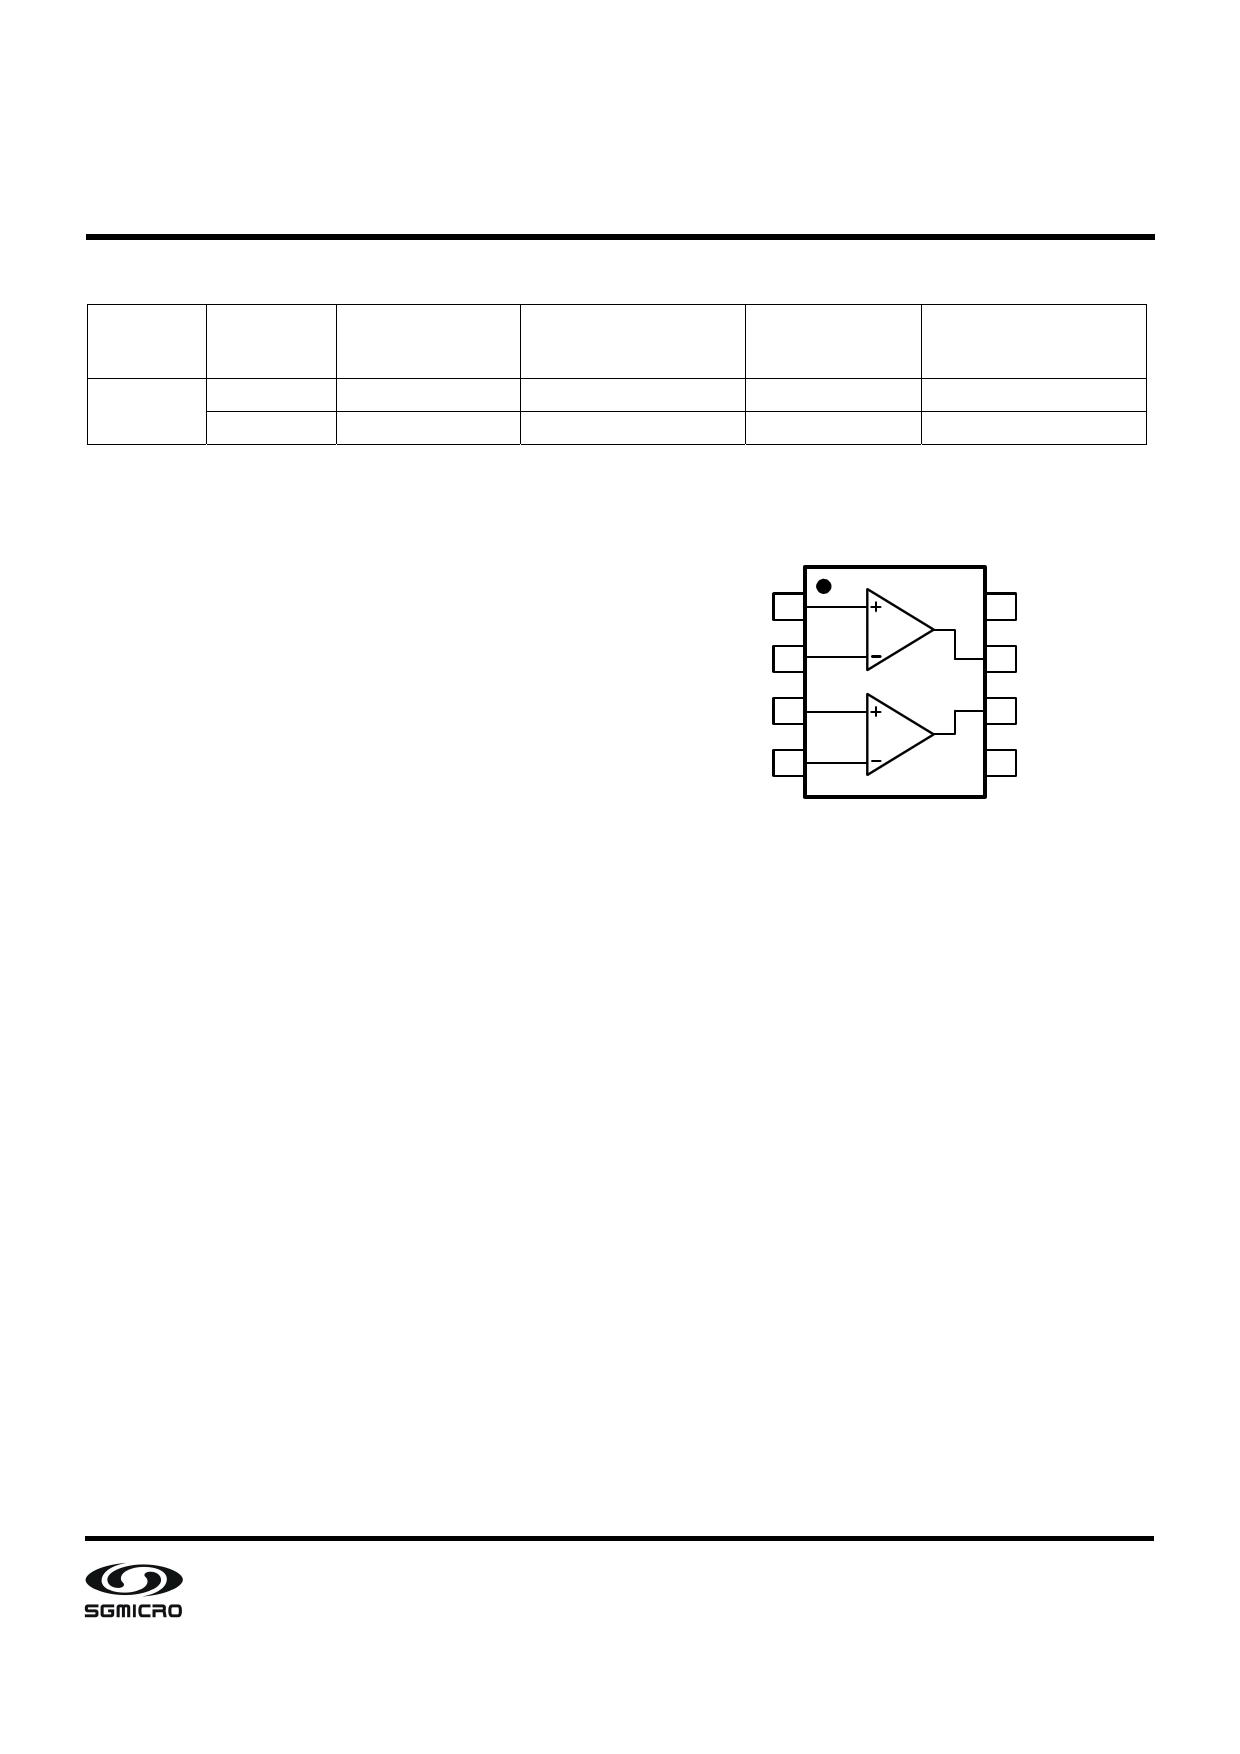 SGM8705 pdf, schematic